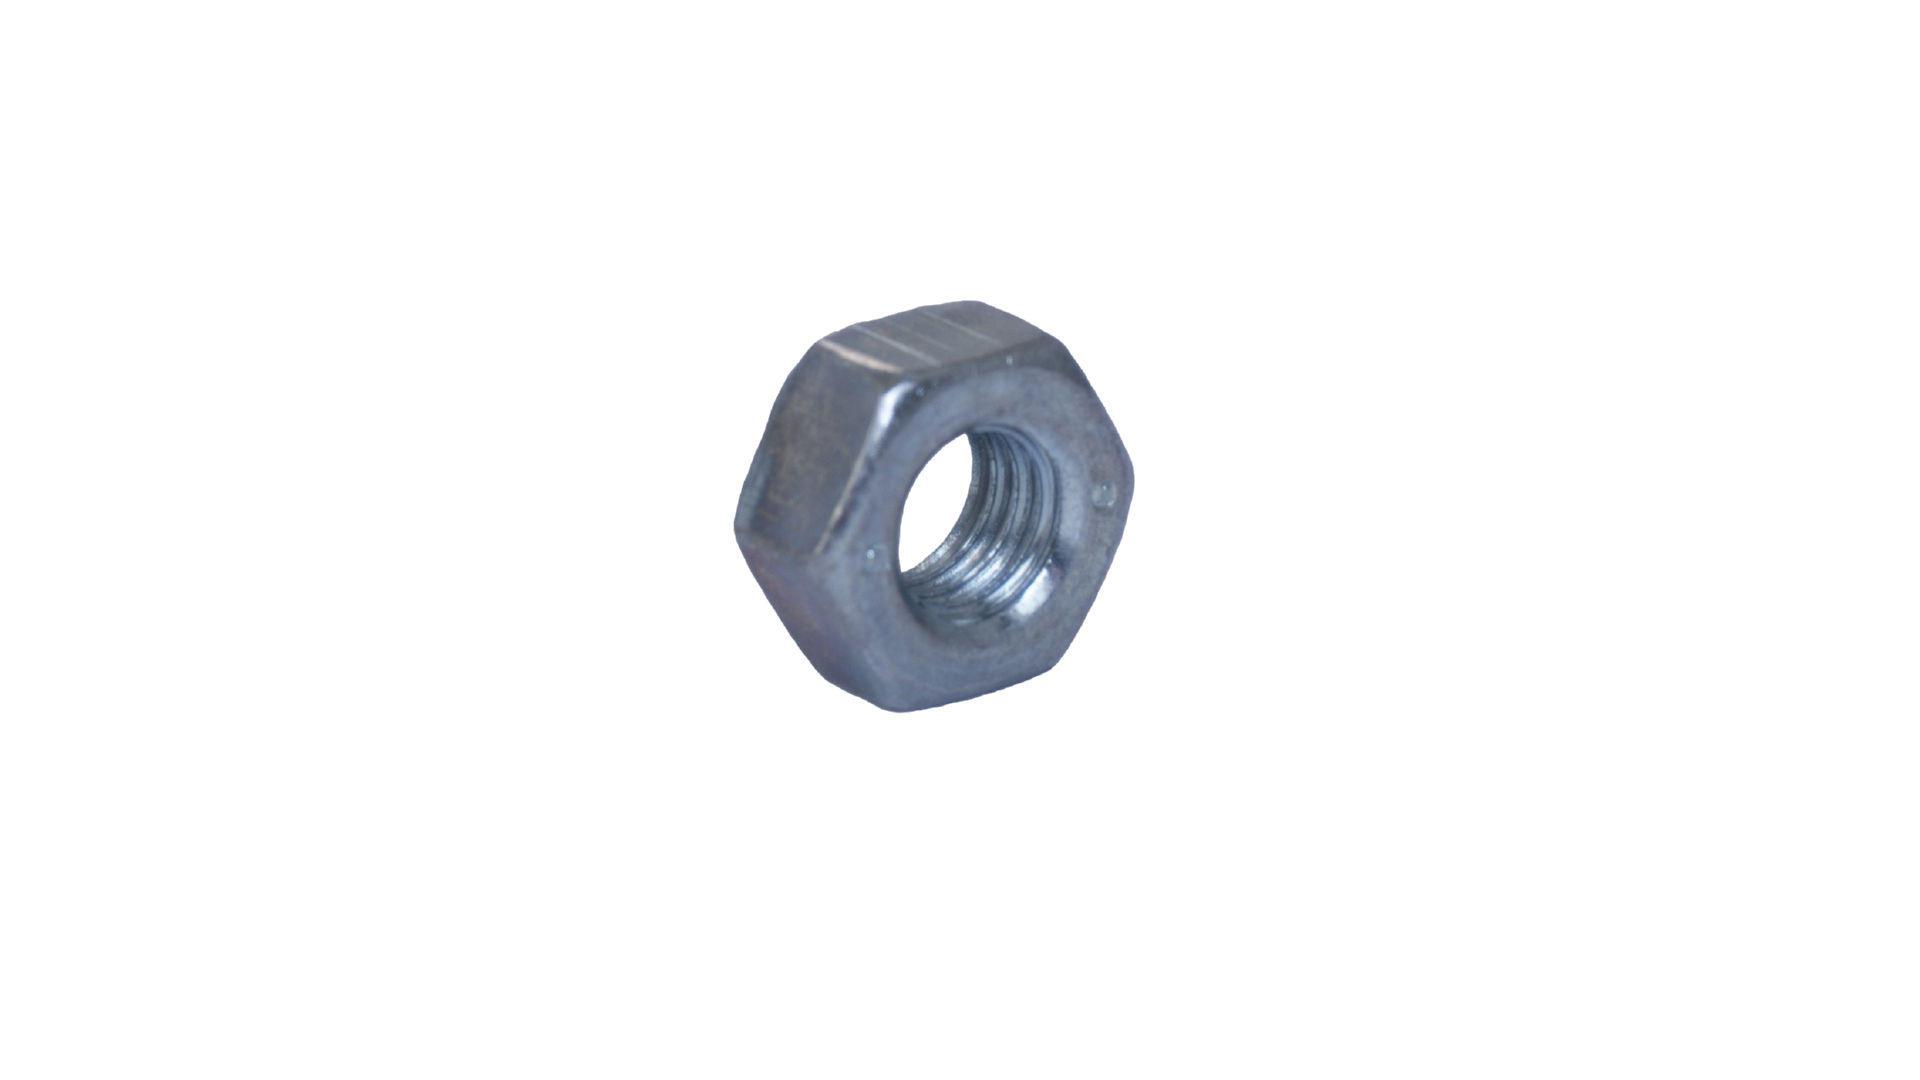 Гайка шестигранная Apro - М6 DIN 934 (200 шт.) 3